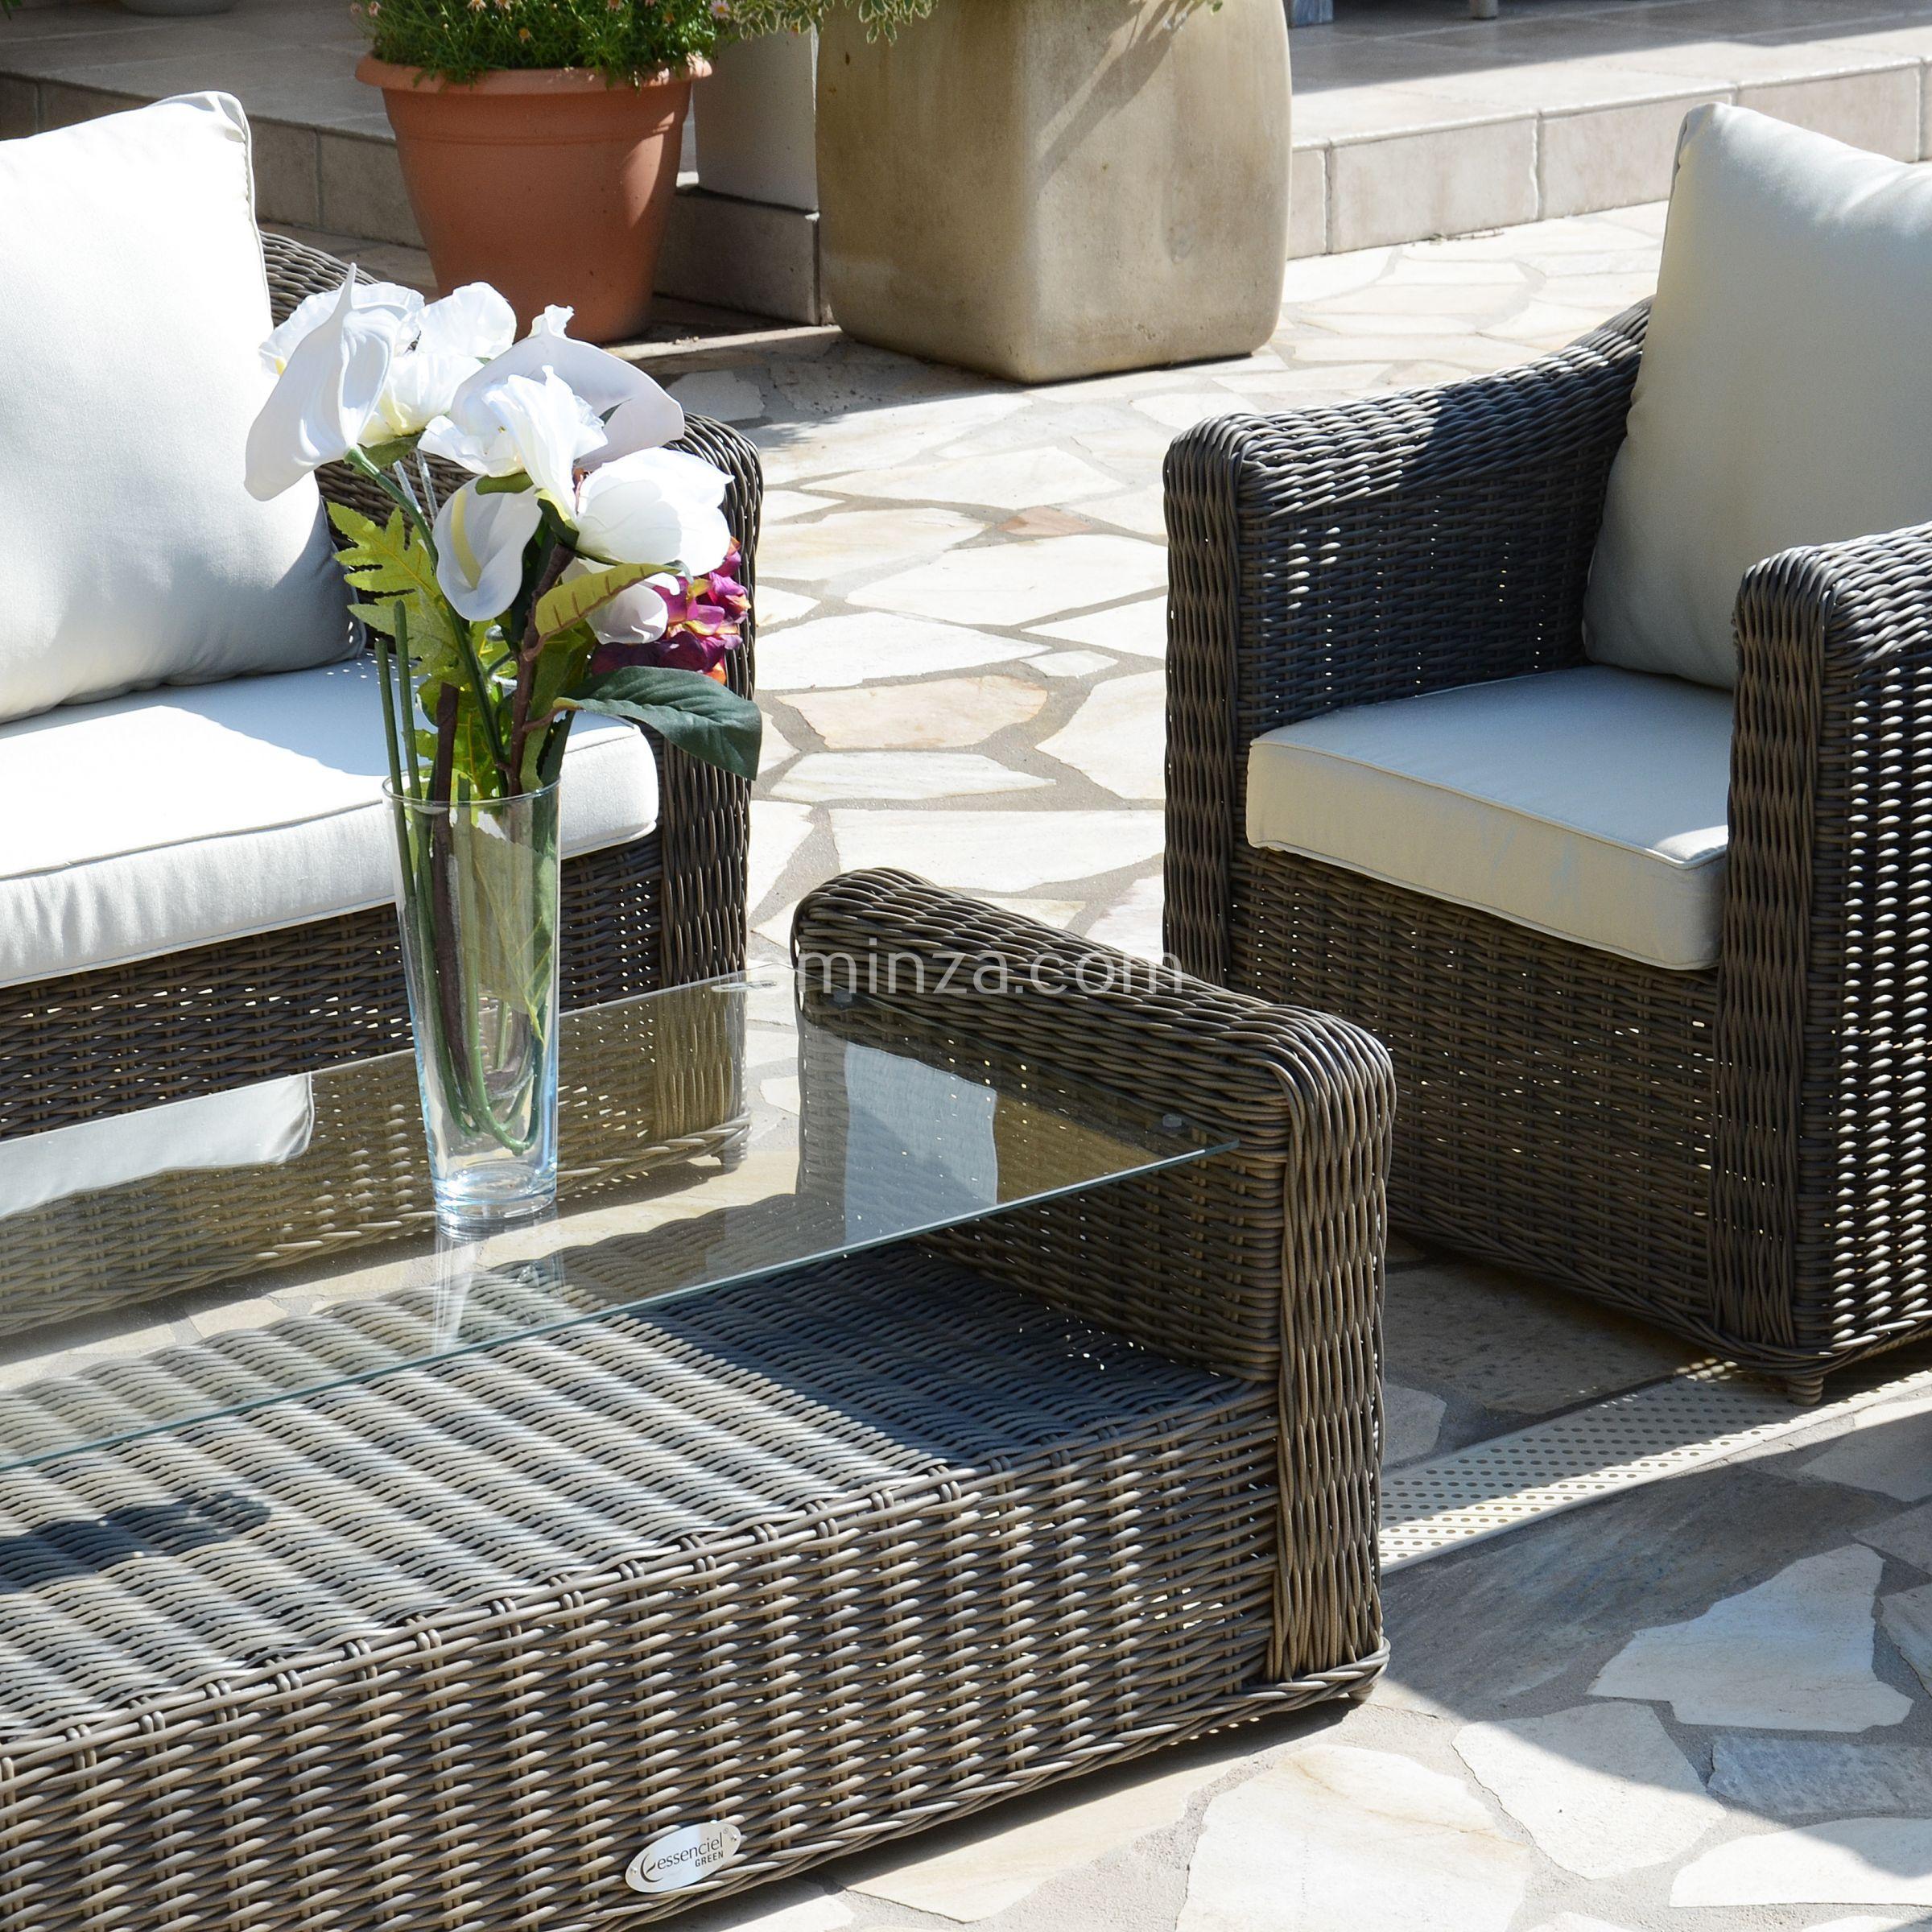 Mobilier De Jardin Occasion. Great Terrasses With Mobilier De Jardin ...